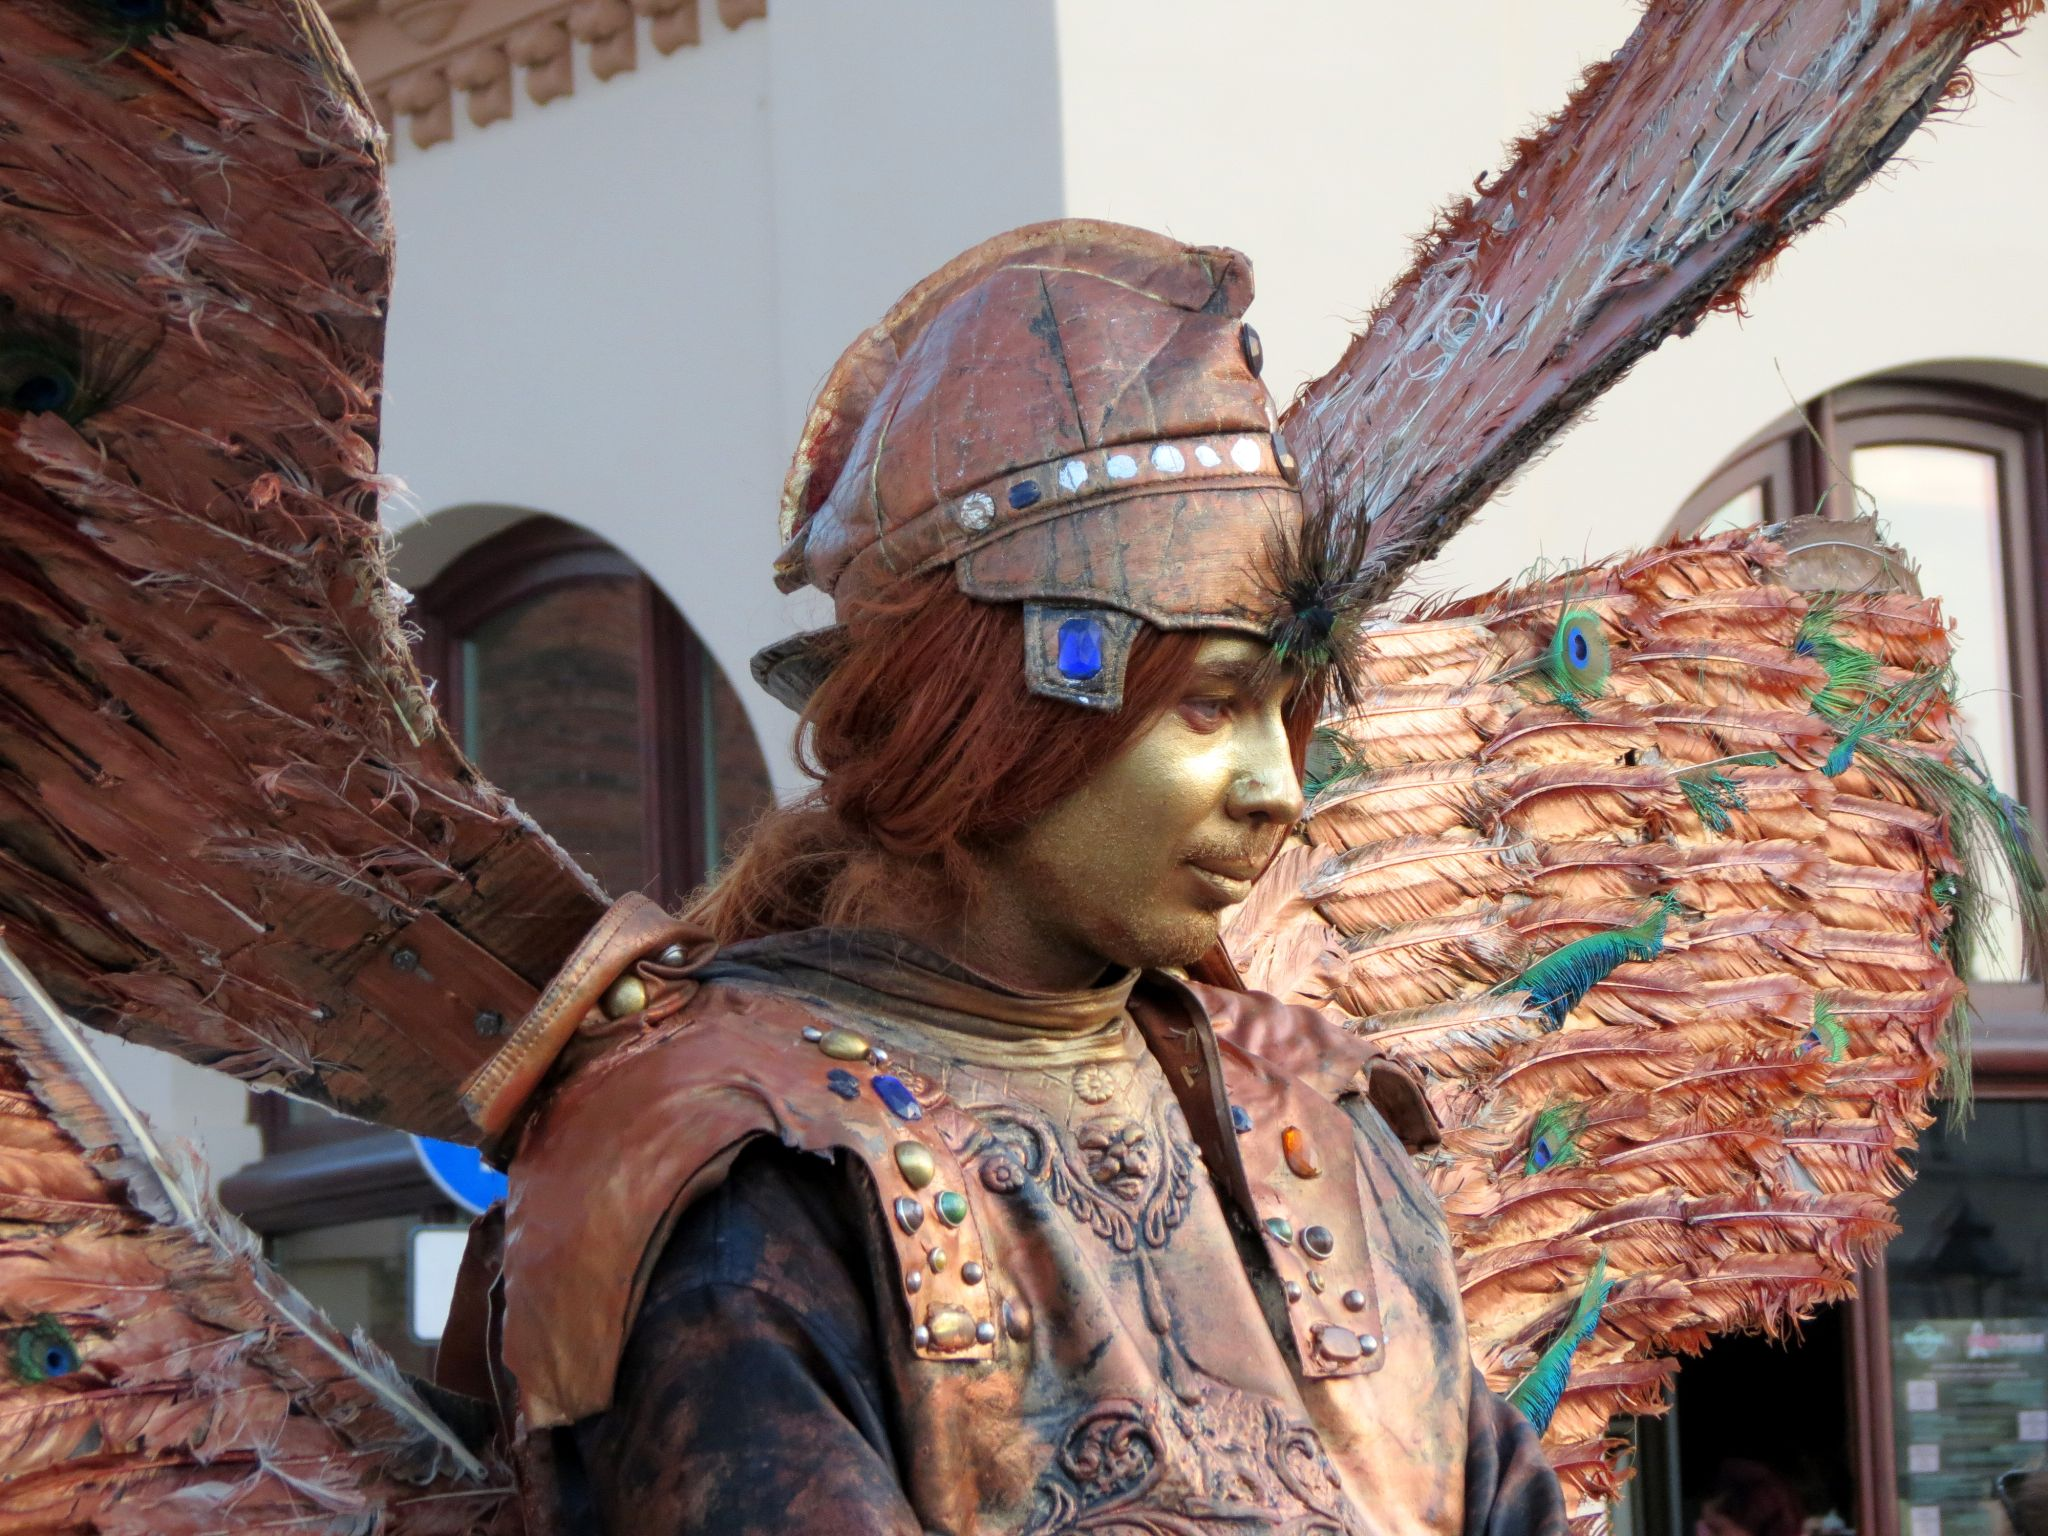 Metallic angel in Krakow/Poland by christopher.kerkovius